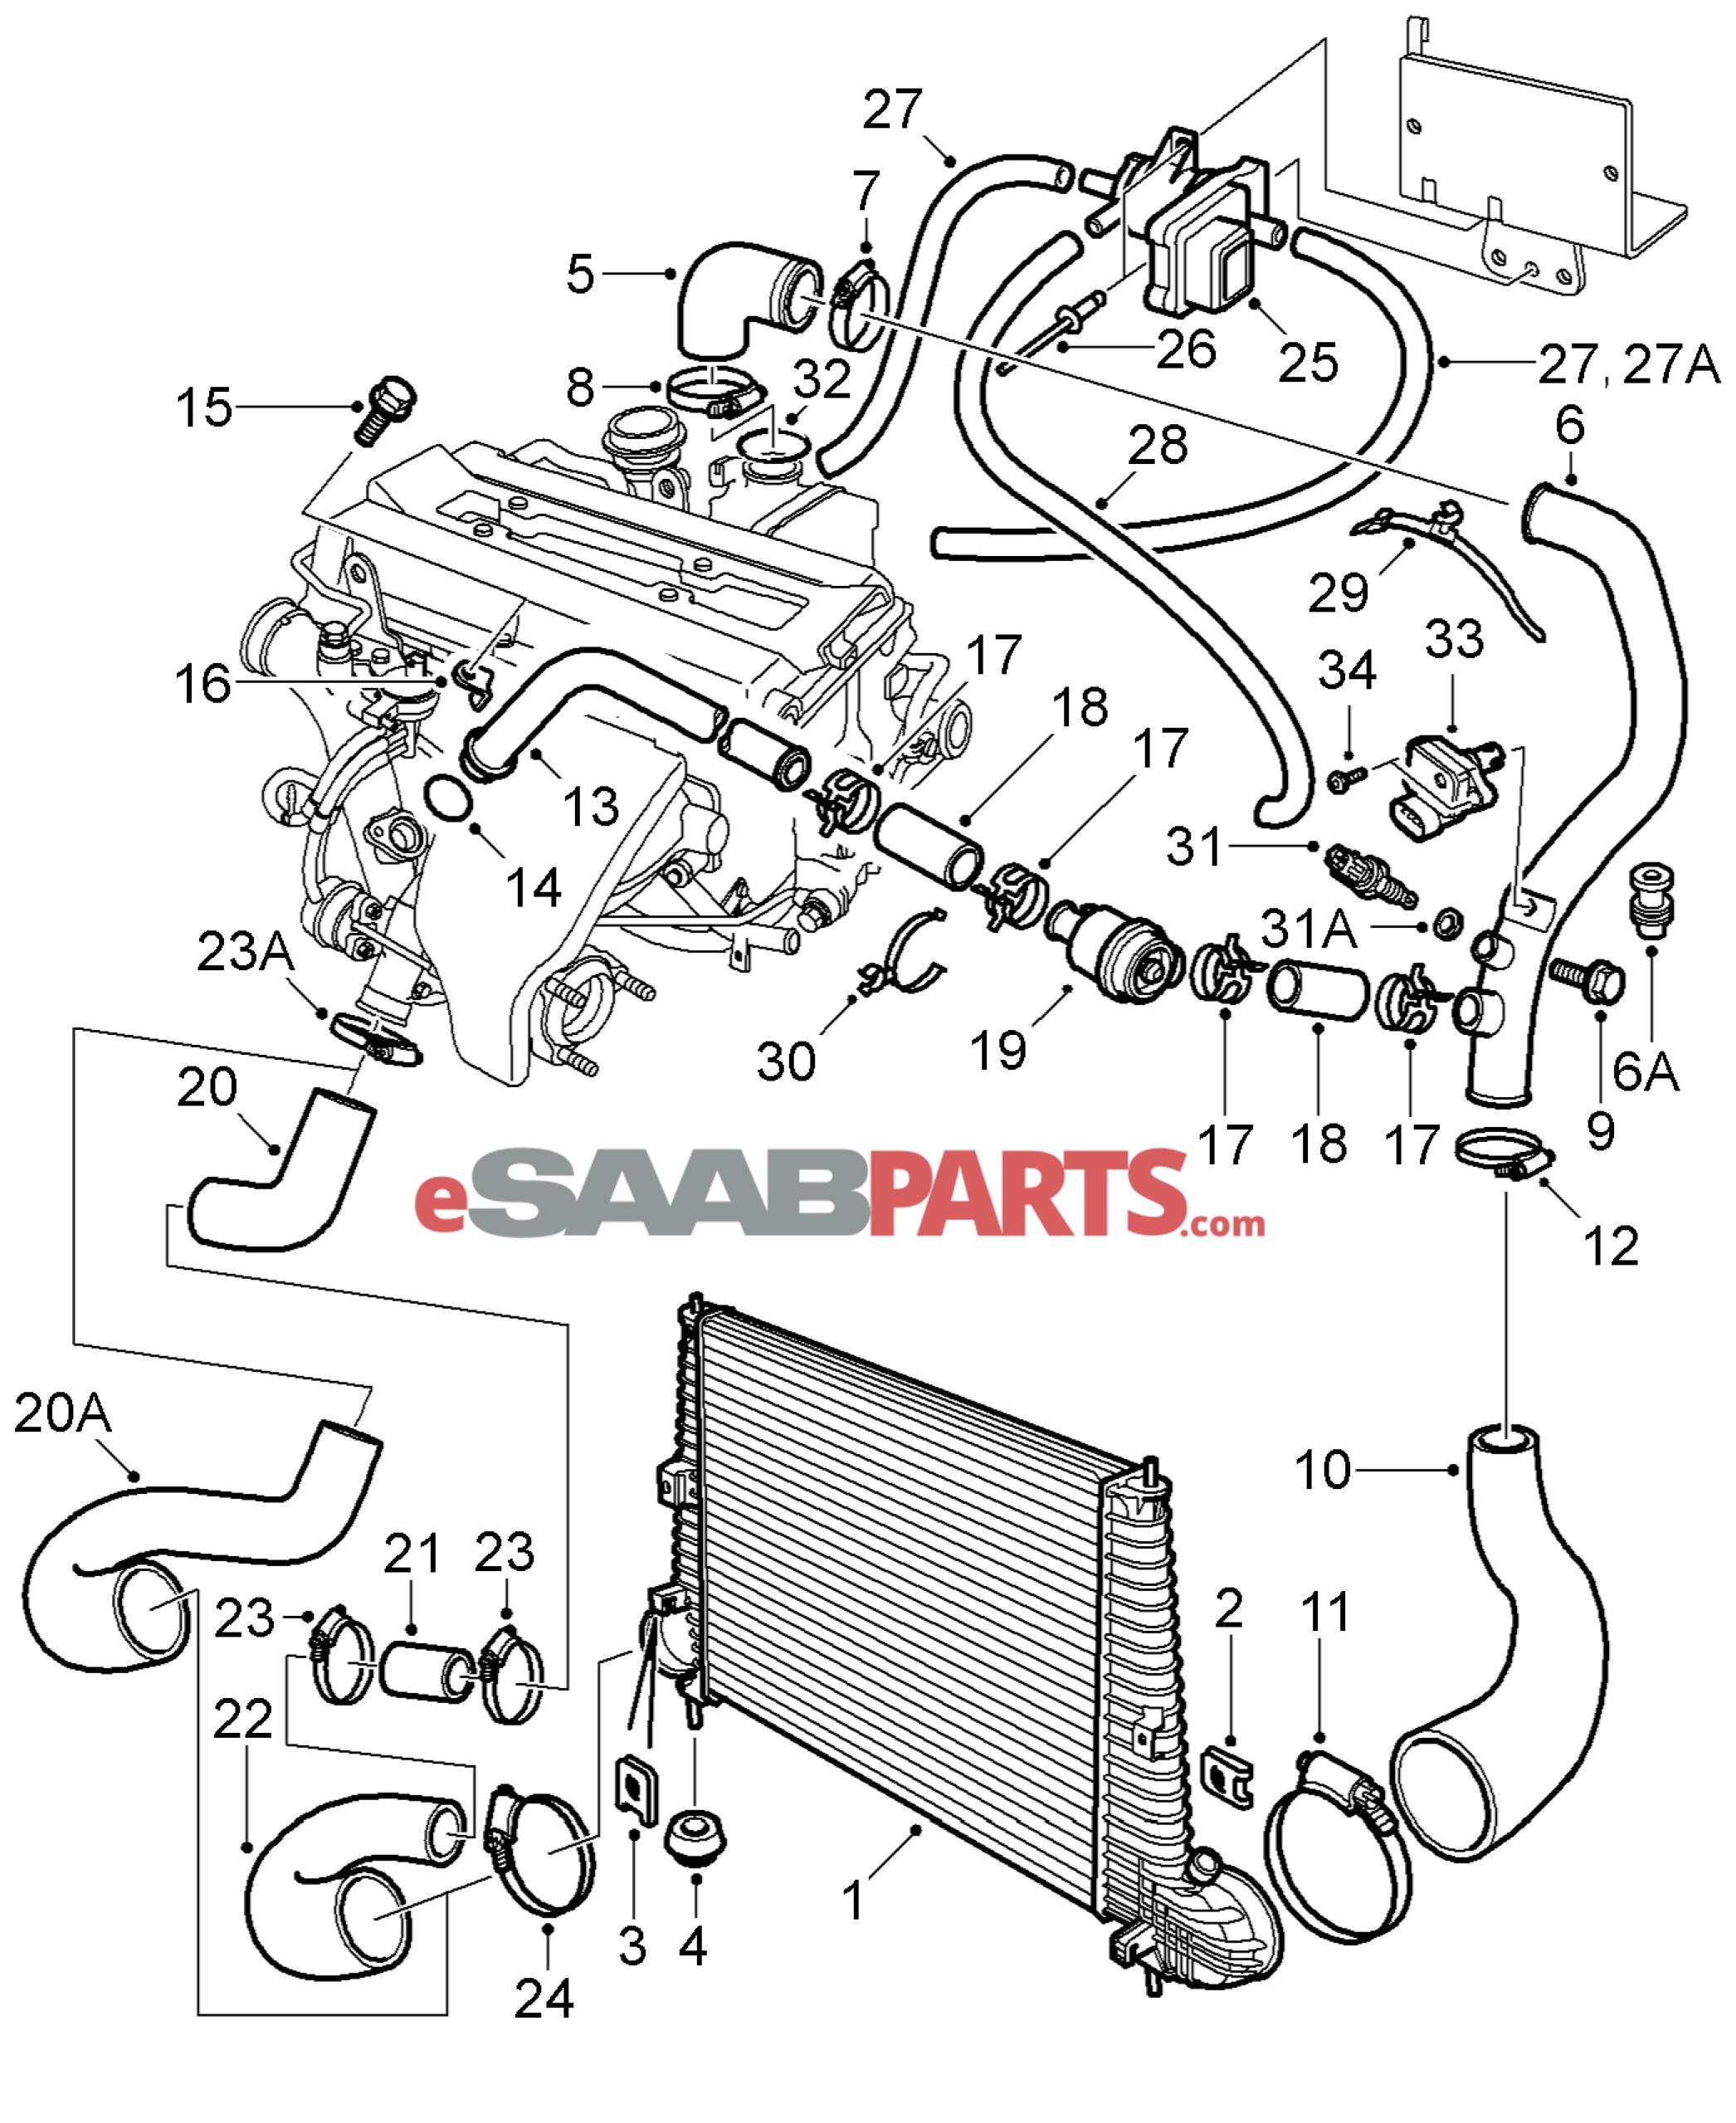 2008 saab 9 3 wiring diagram genie excelerator garage door opener linear engine 2 0t